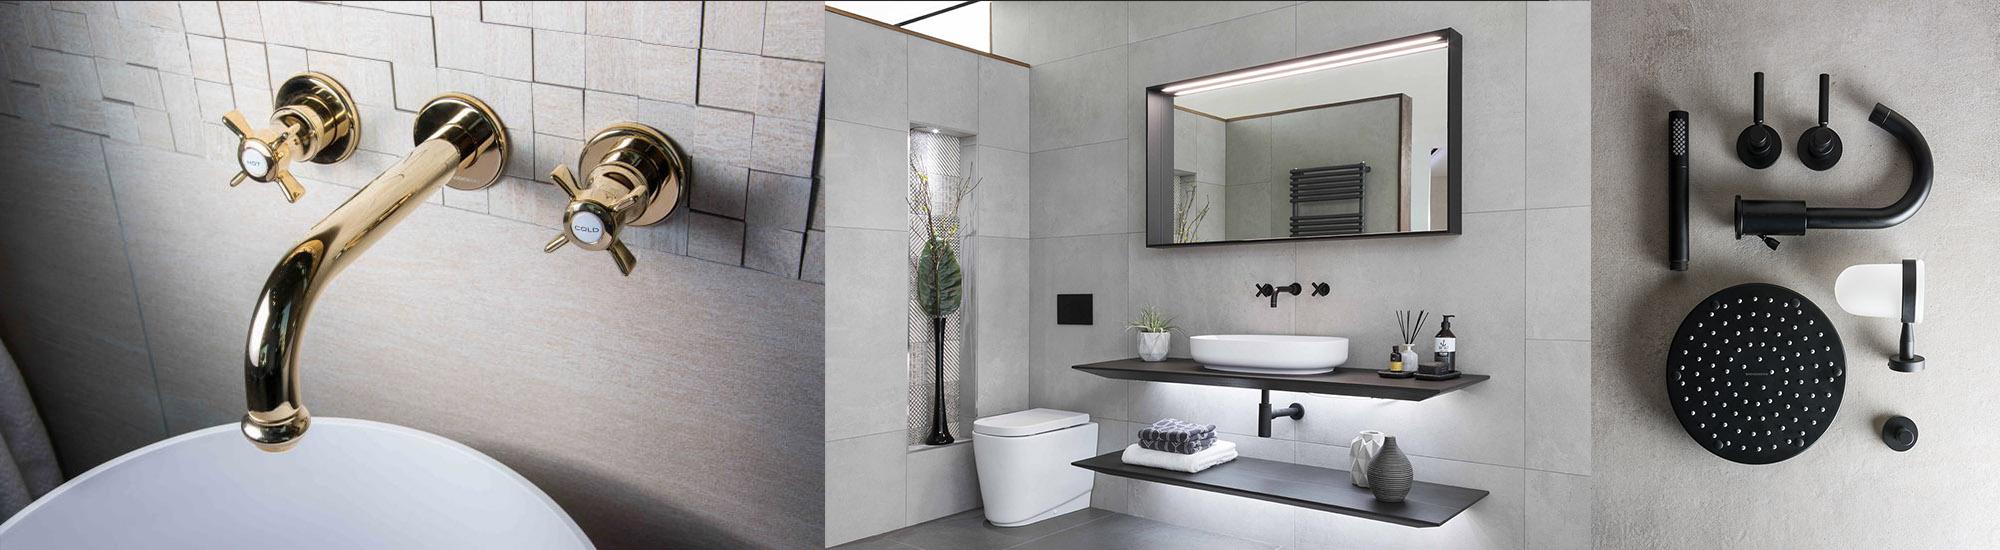 Bathroom Designers Exeter - Kitchenworld